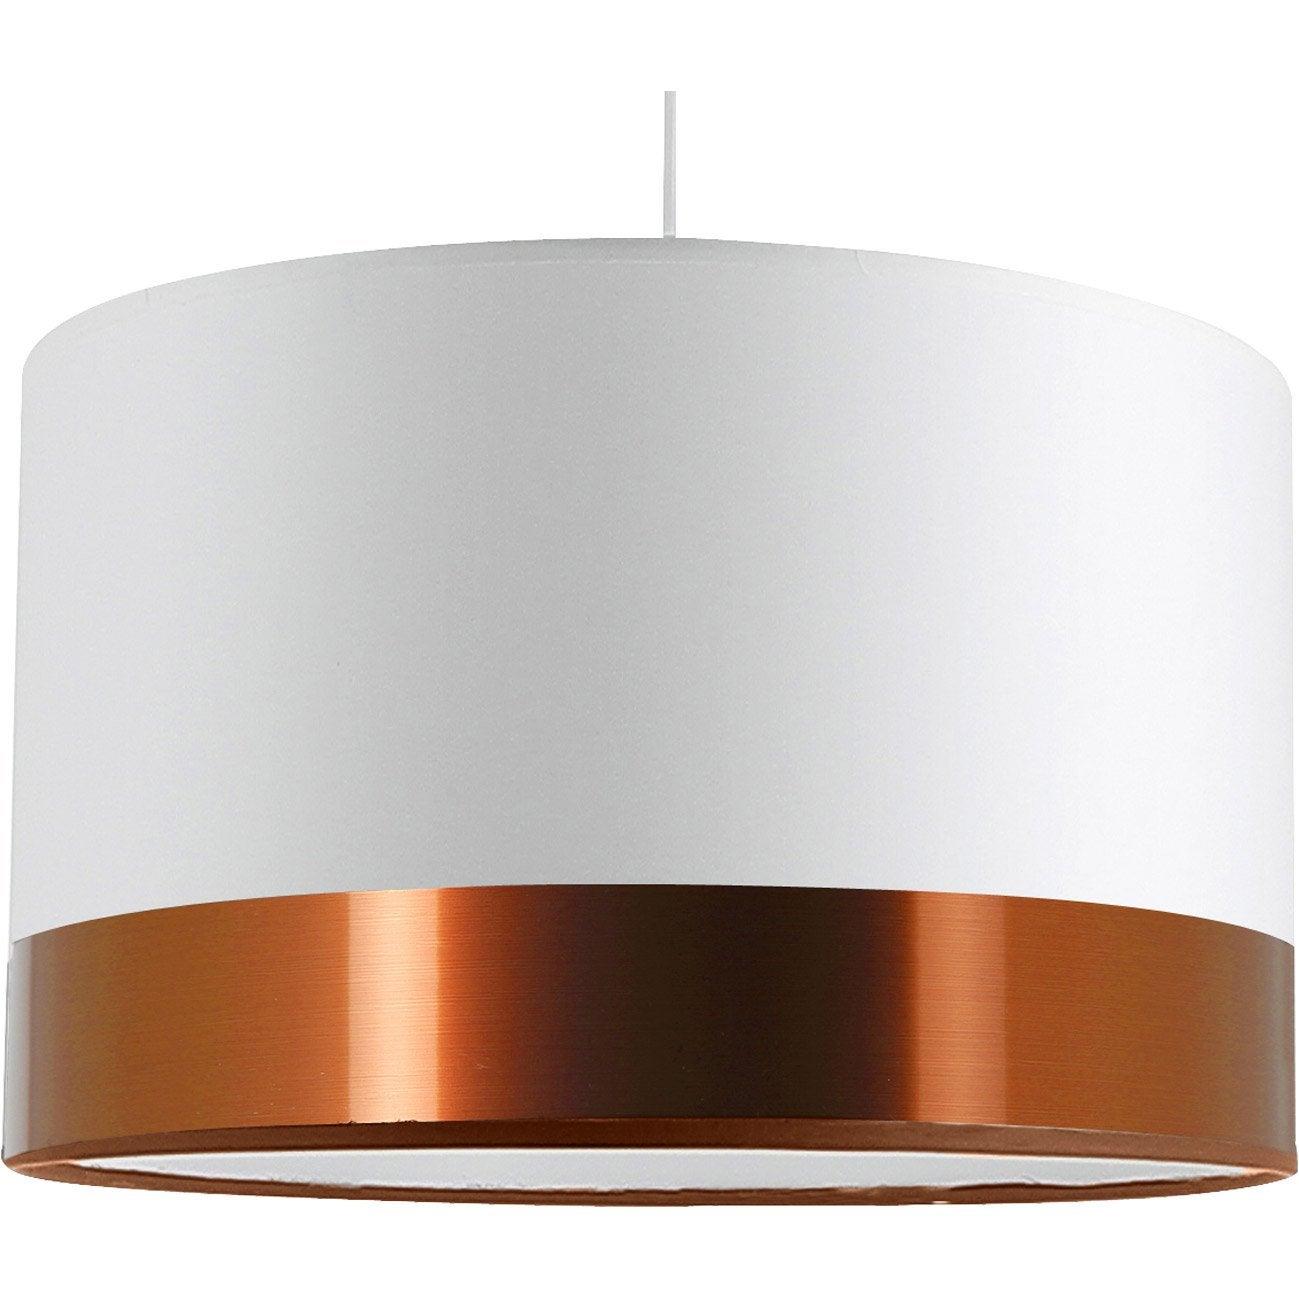 Suspension, classique chic blanc/cuivre plastique METROPOLIGHT Natt 1 lumière(s)